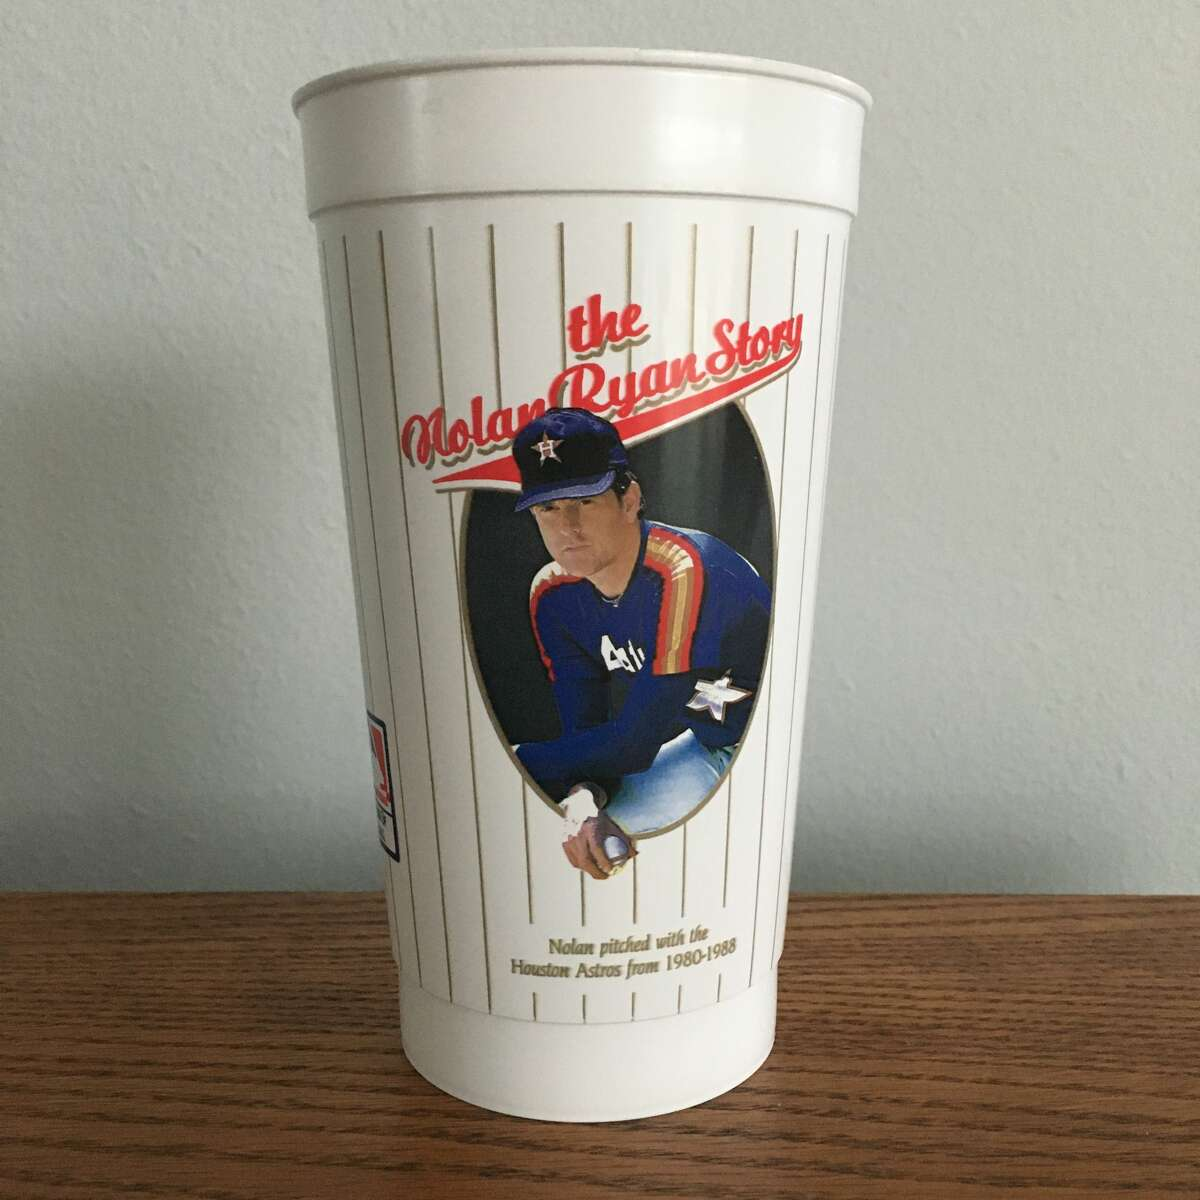 A 1980s Whataburger cup shows baseball legend Nolan Ryan. Ojeda bought a set of a dozen cups to obtain the Astros version of this design.